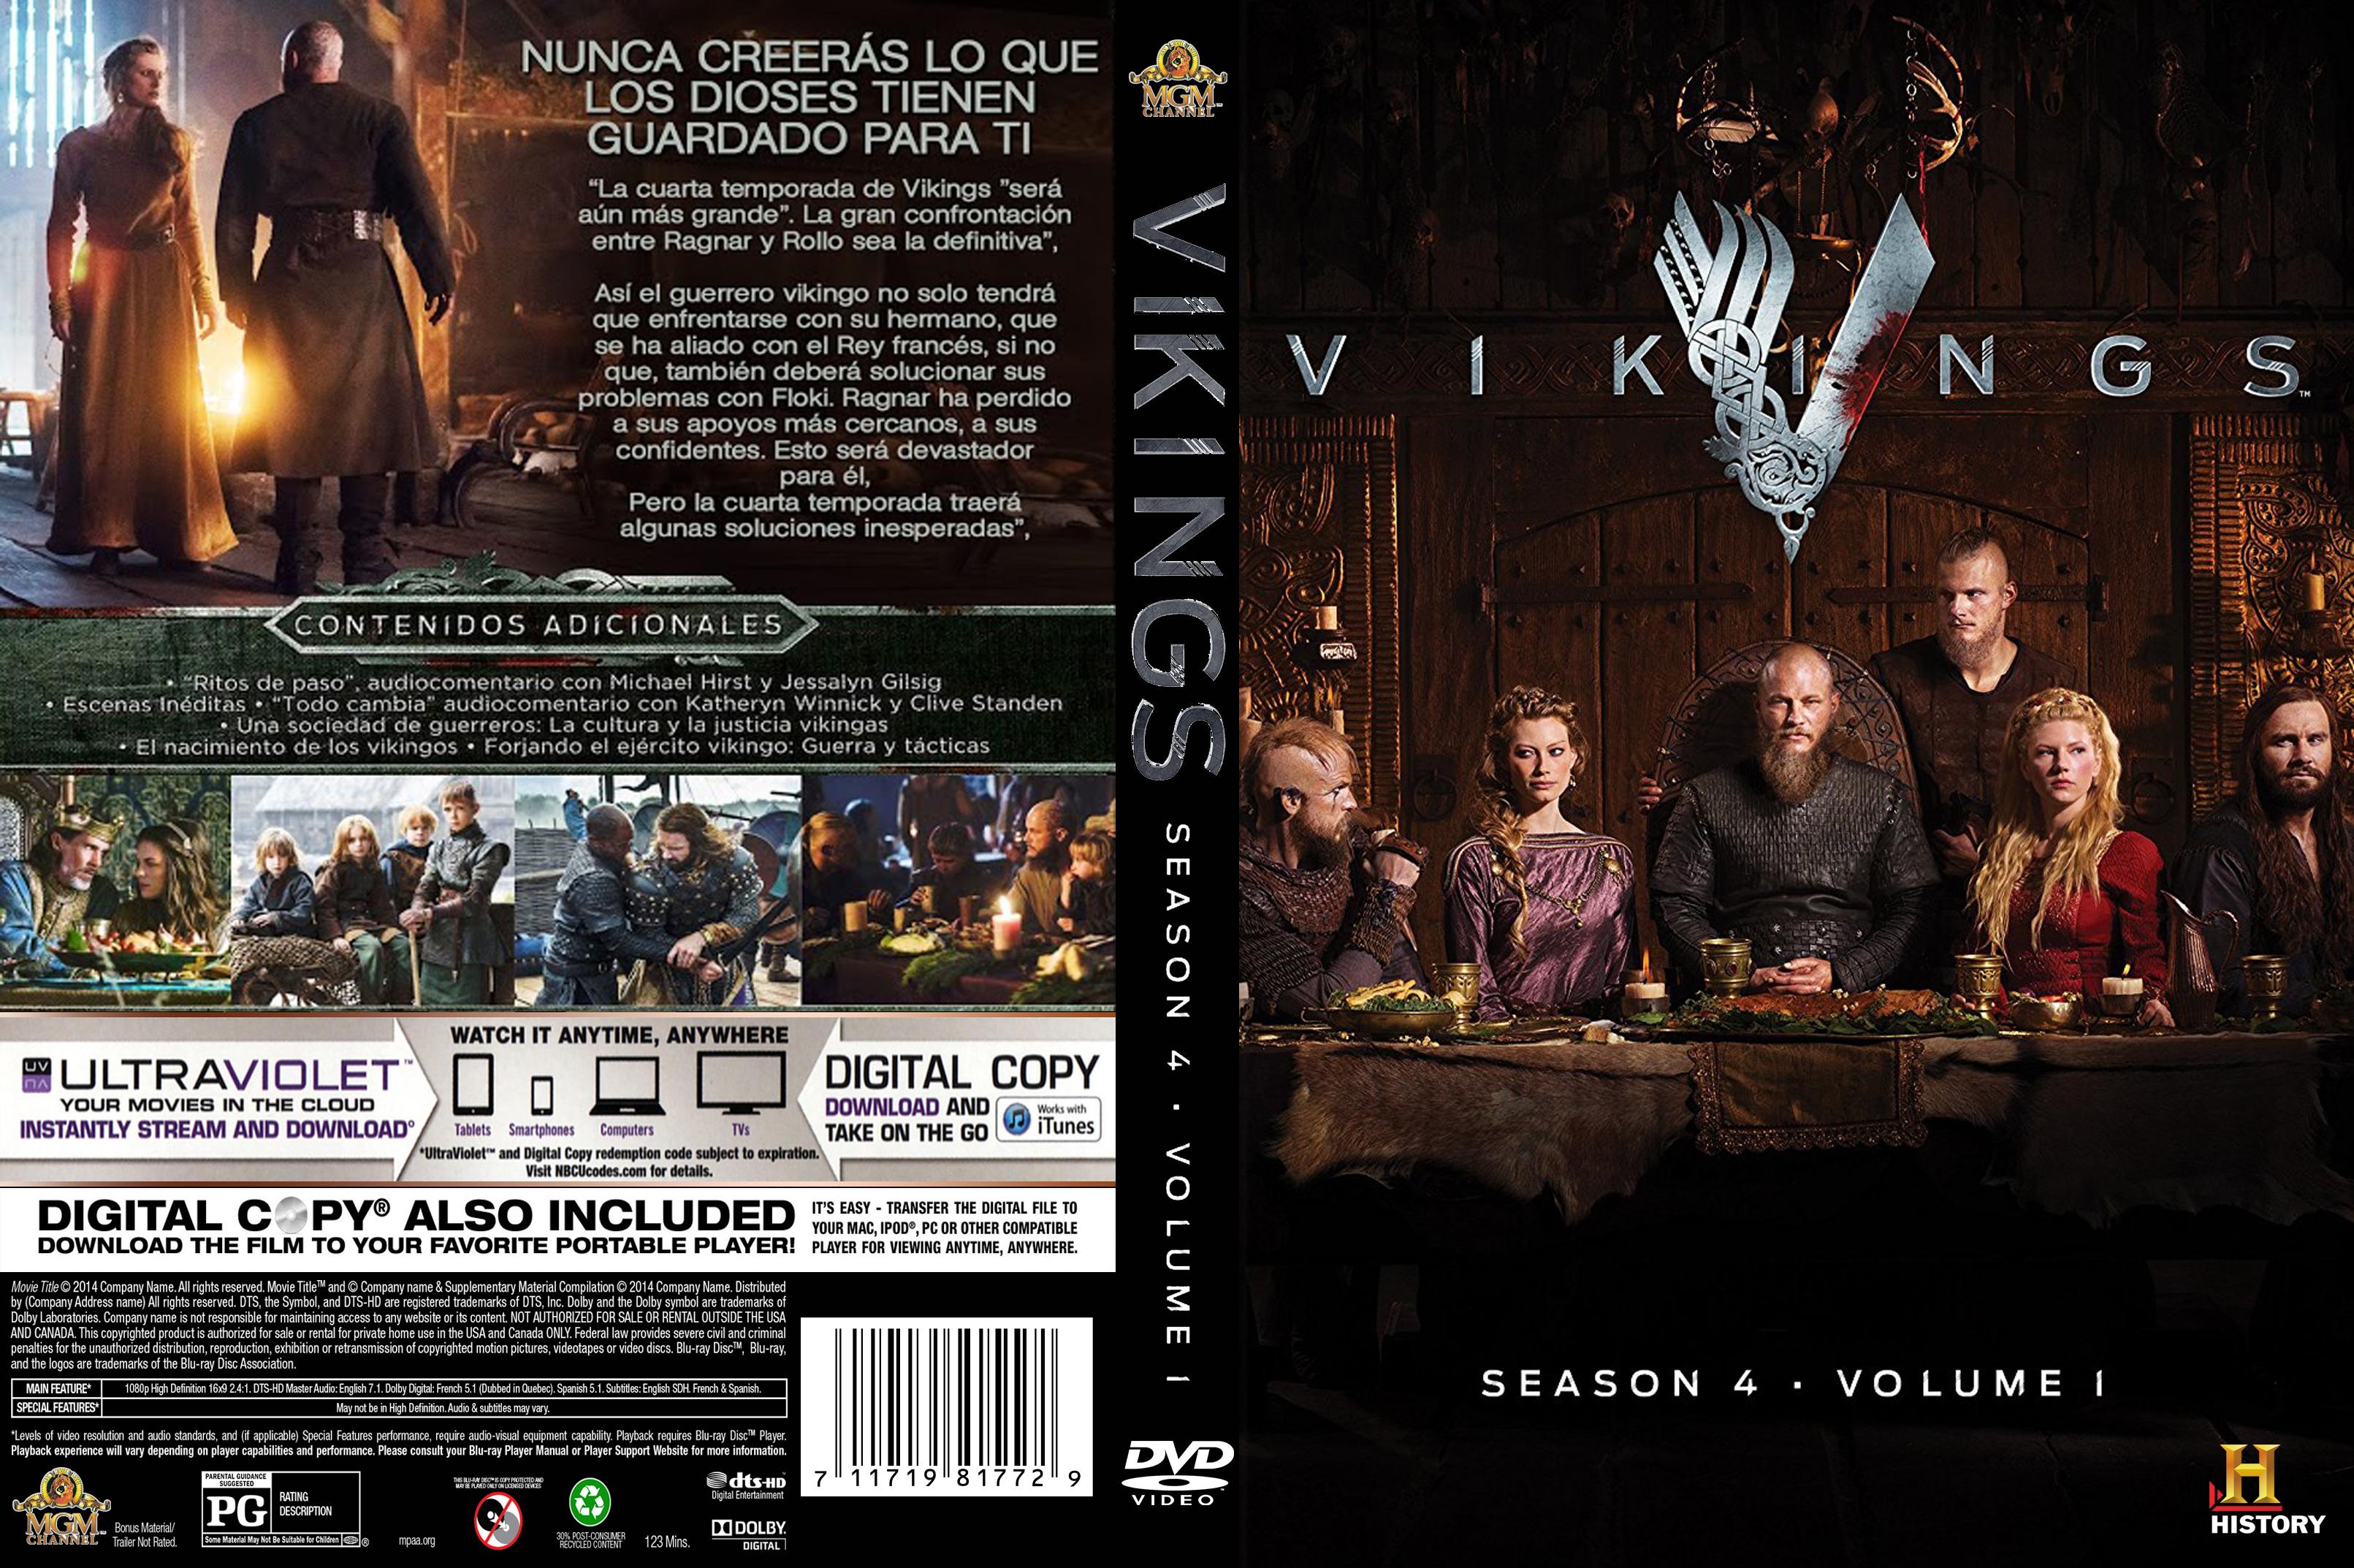 covers box sk vikings season 4 volume 1 2016   high